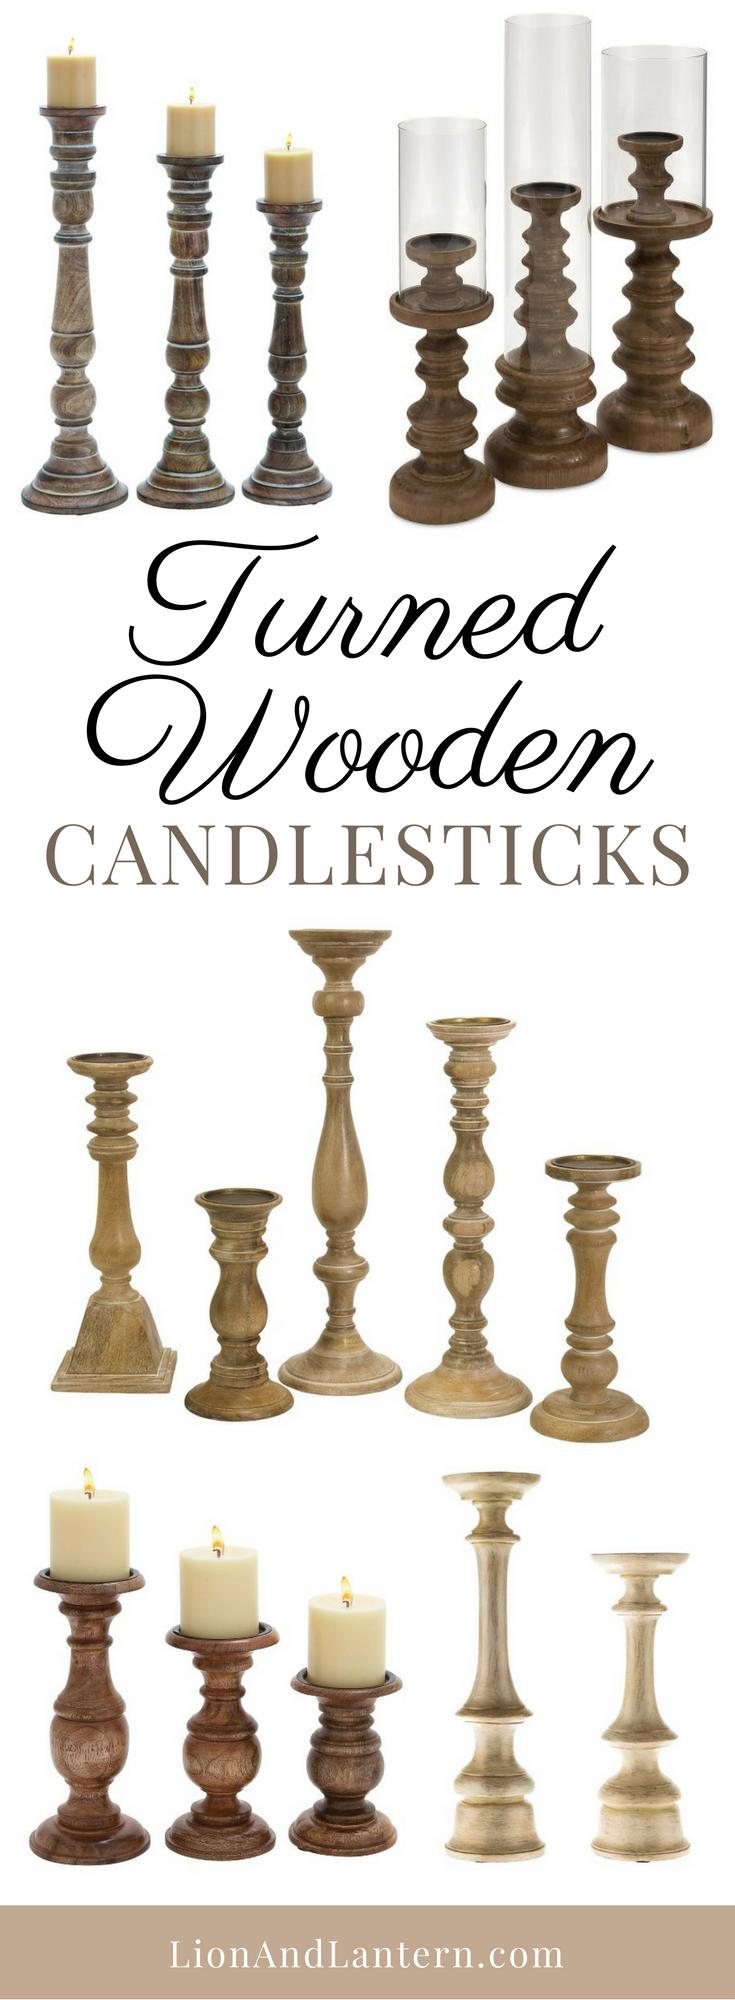 Turned Wooden Candlesticks at LionAndLantern.com. Farmhouse candlestick, candle holder, turned candle holder, rustic candle stick